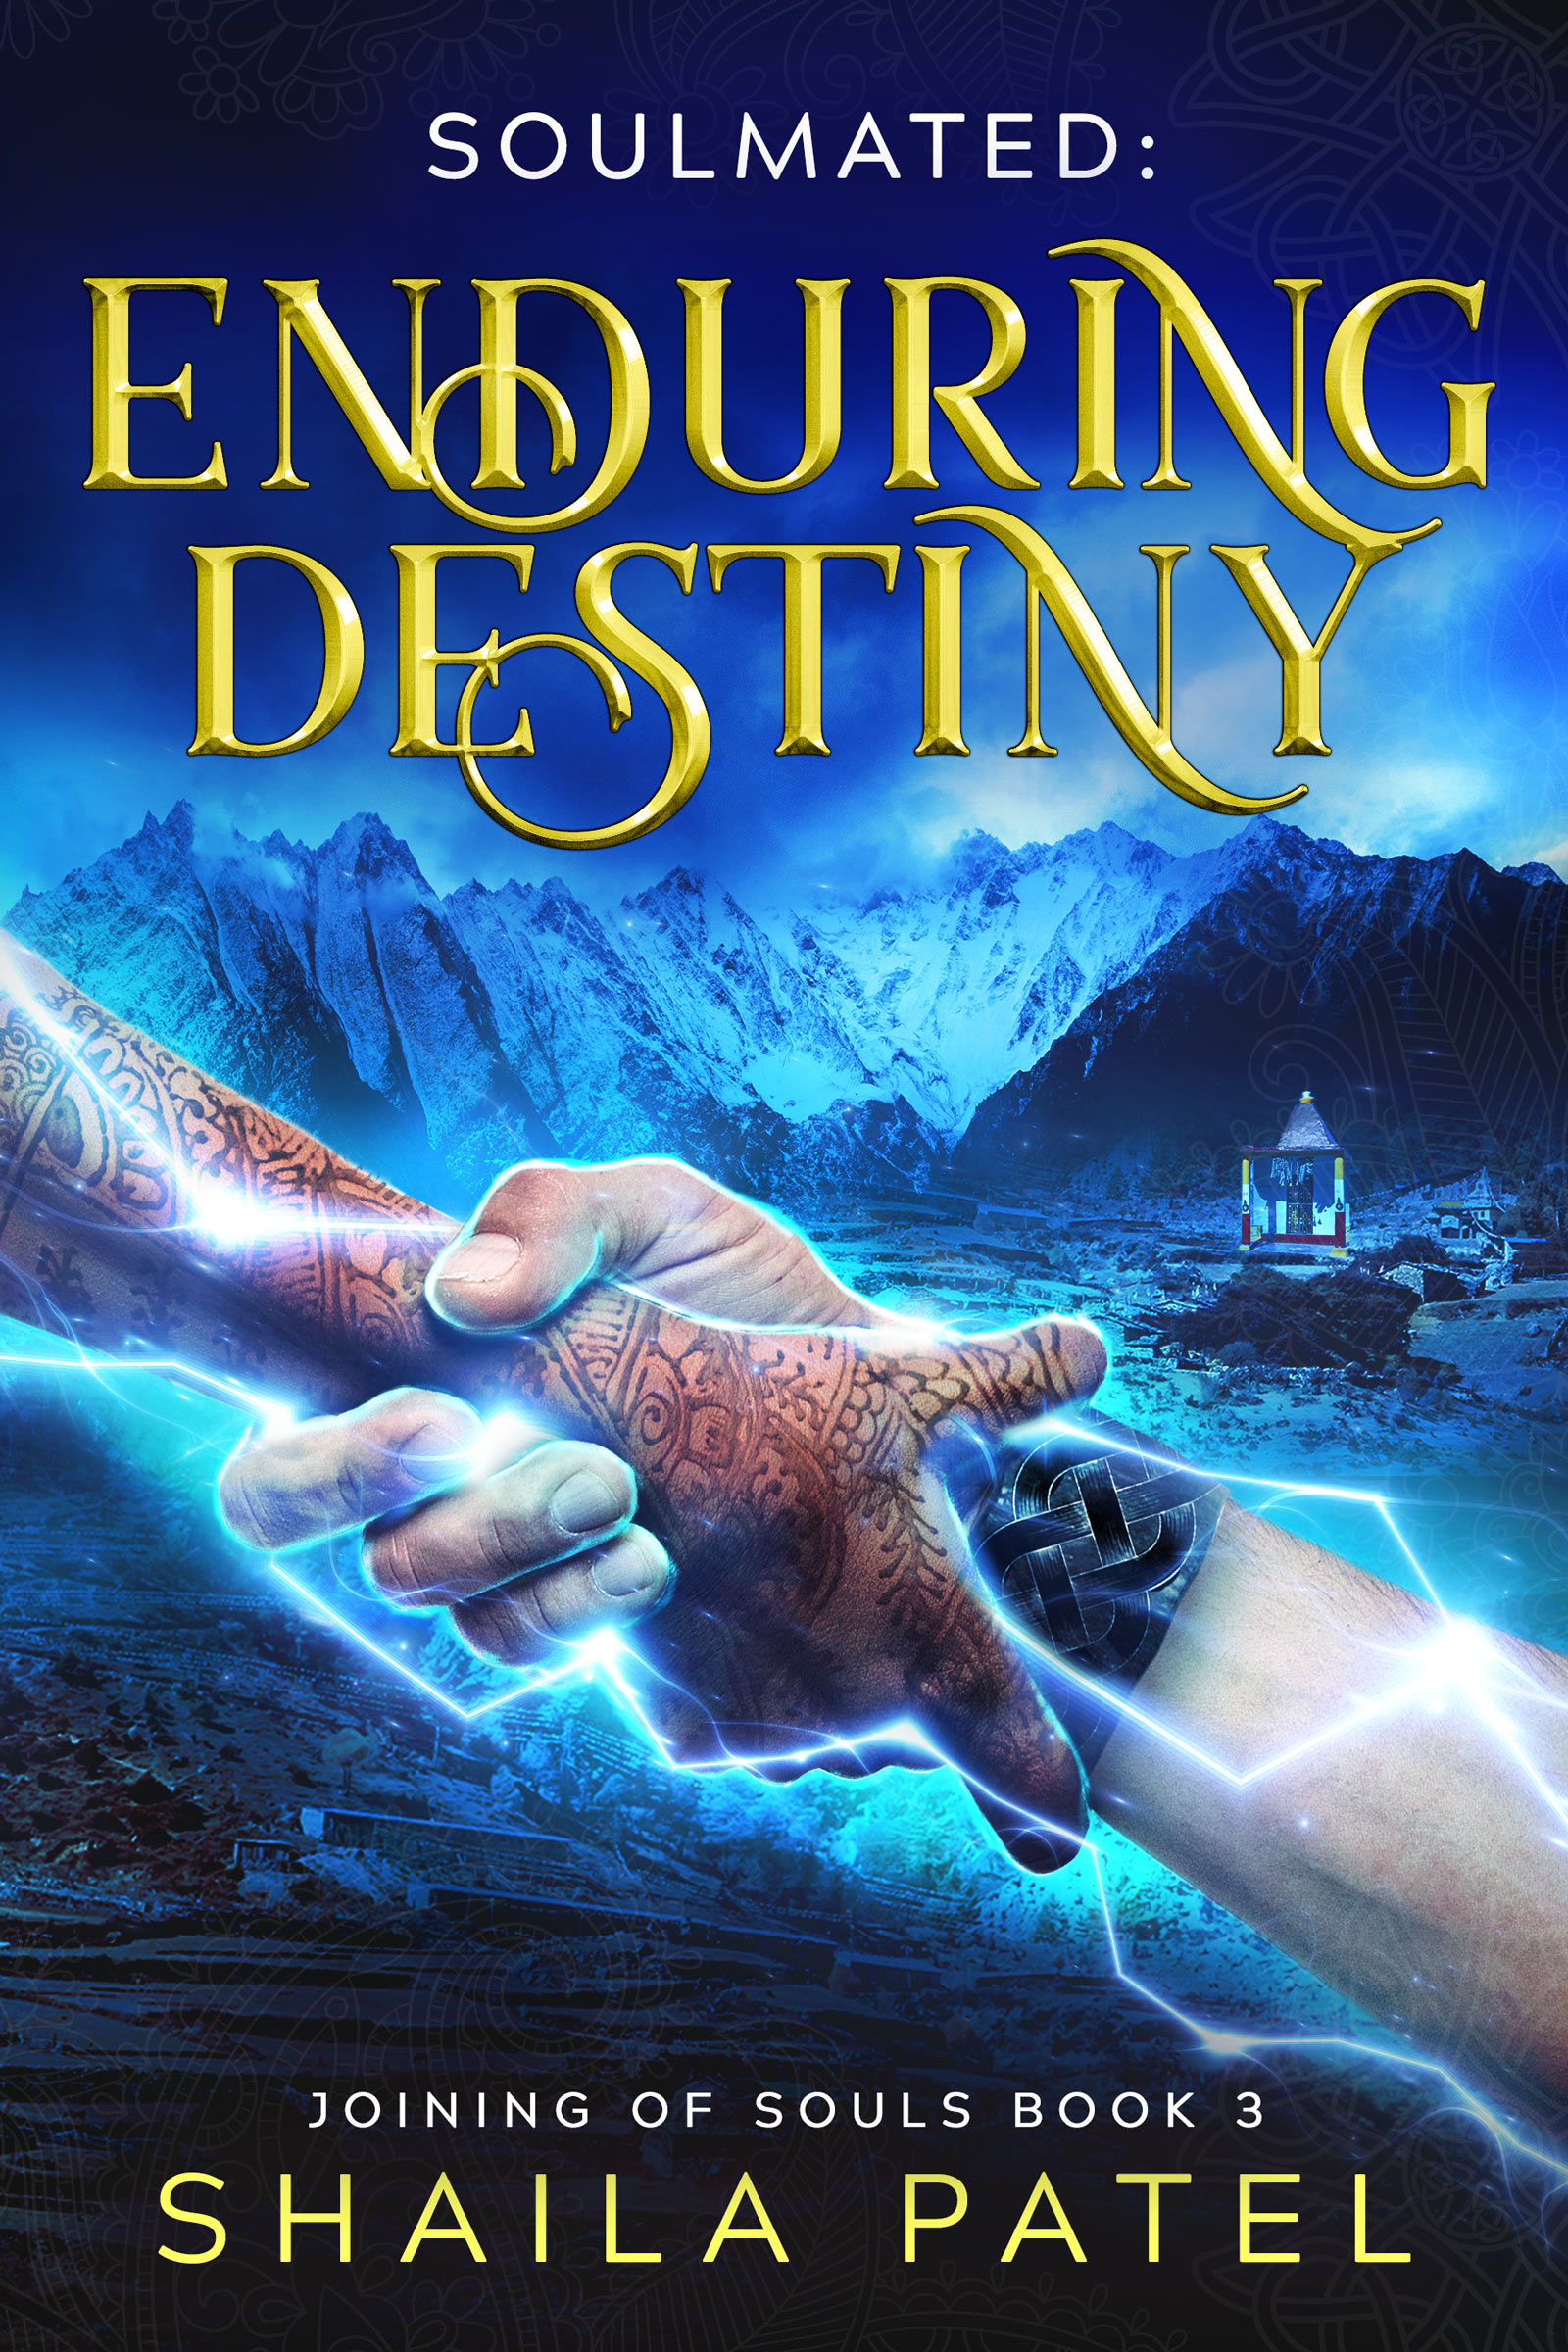 EnduringDestiny_Ebook_BN.jpg